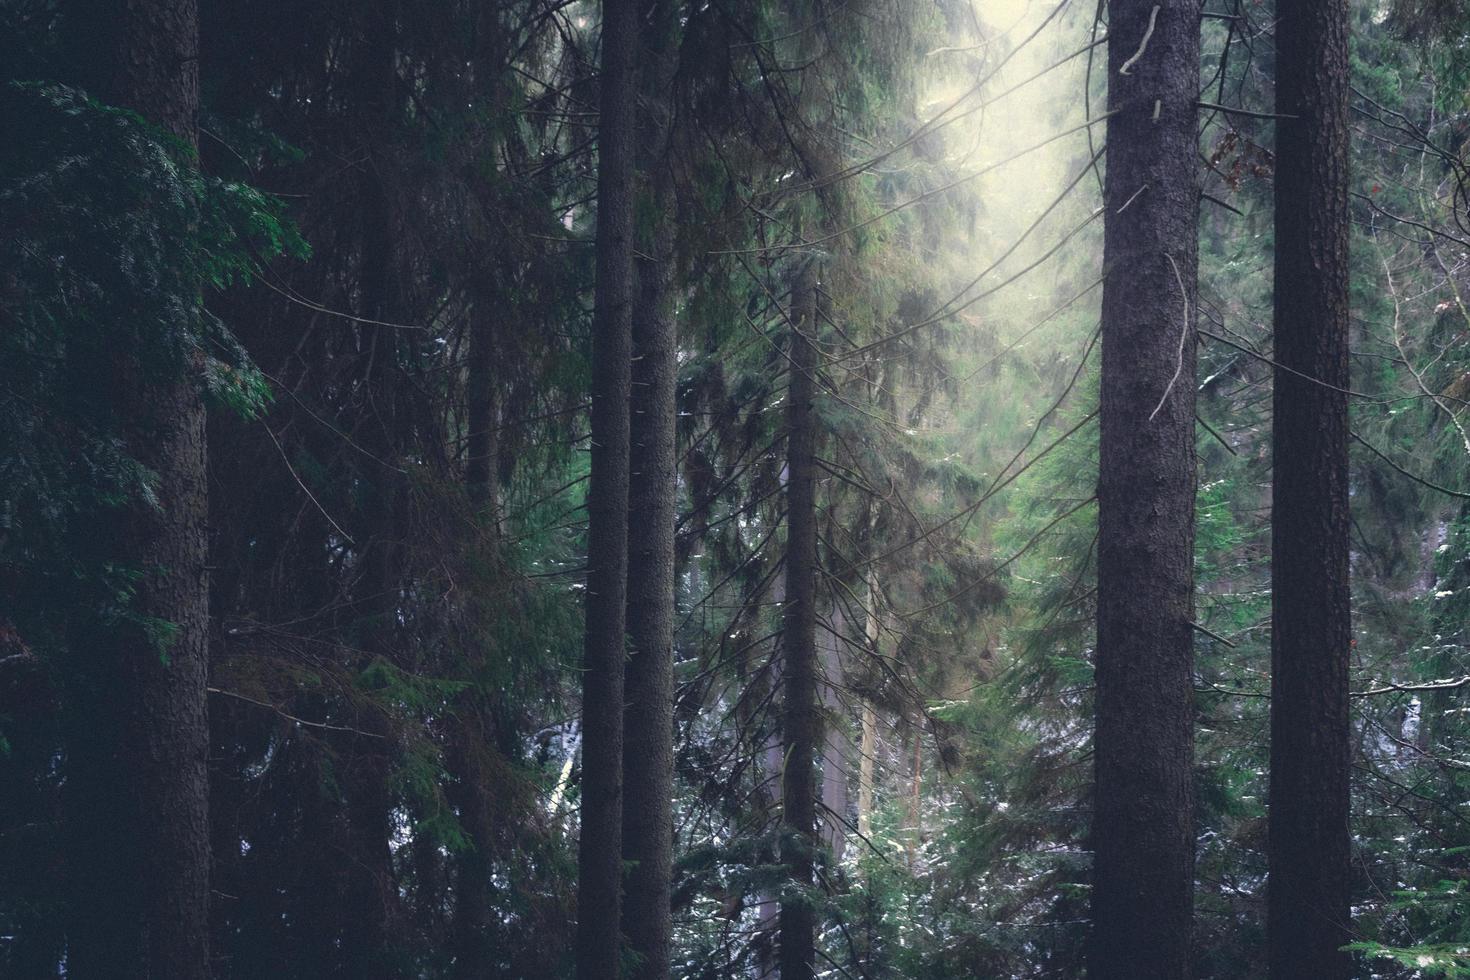 Misty forest in Czechia photo